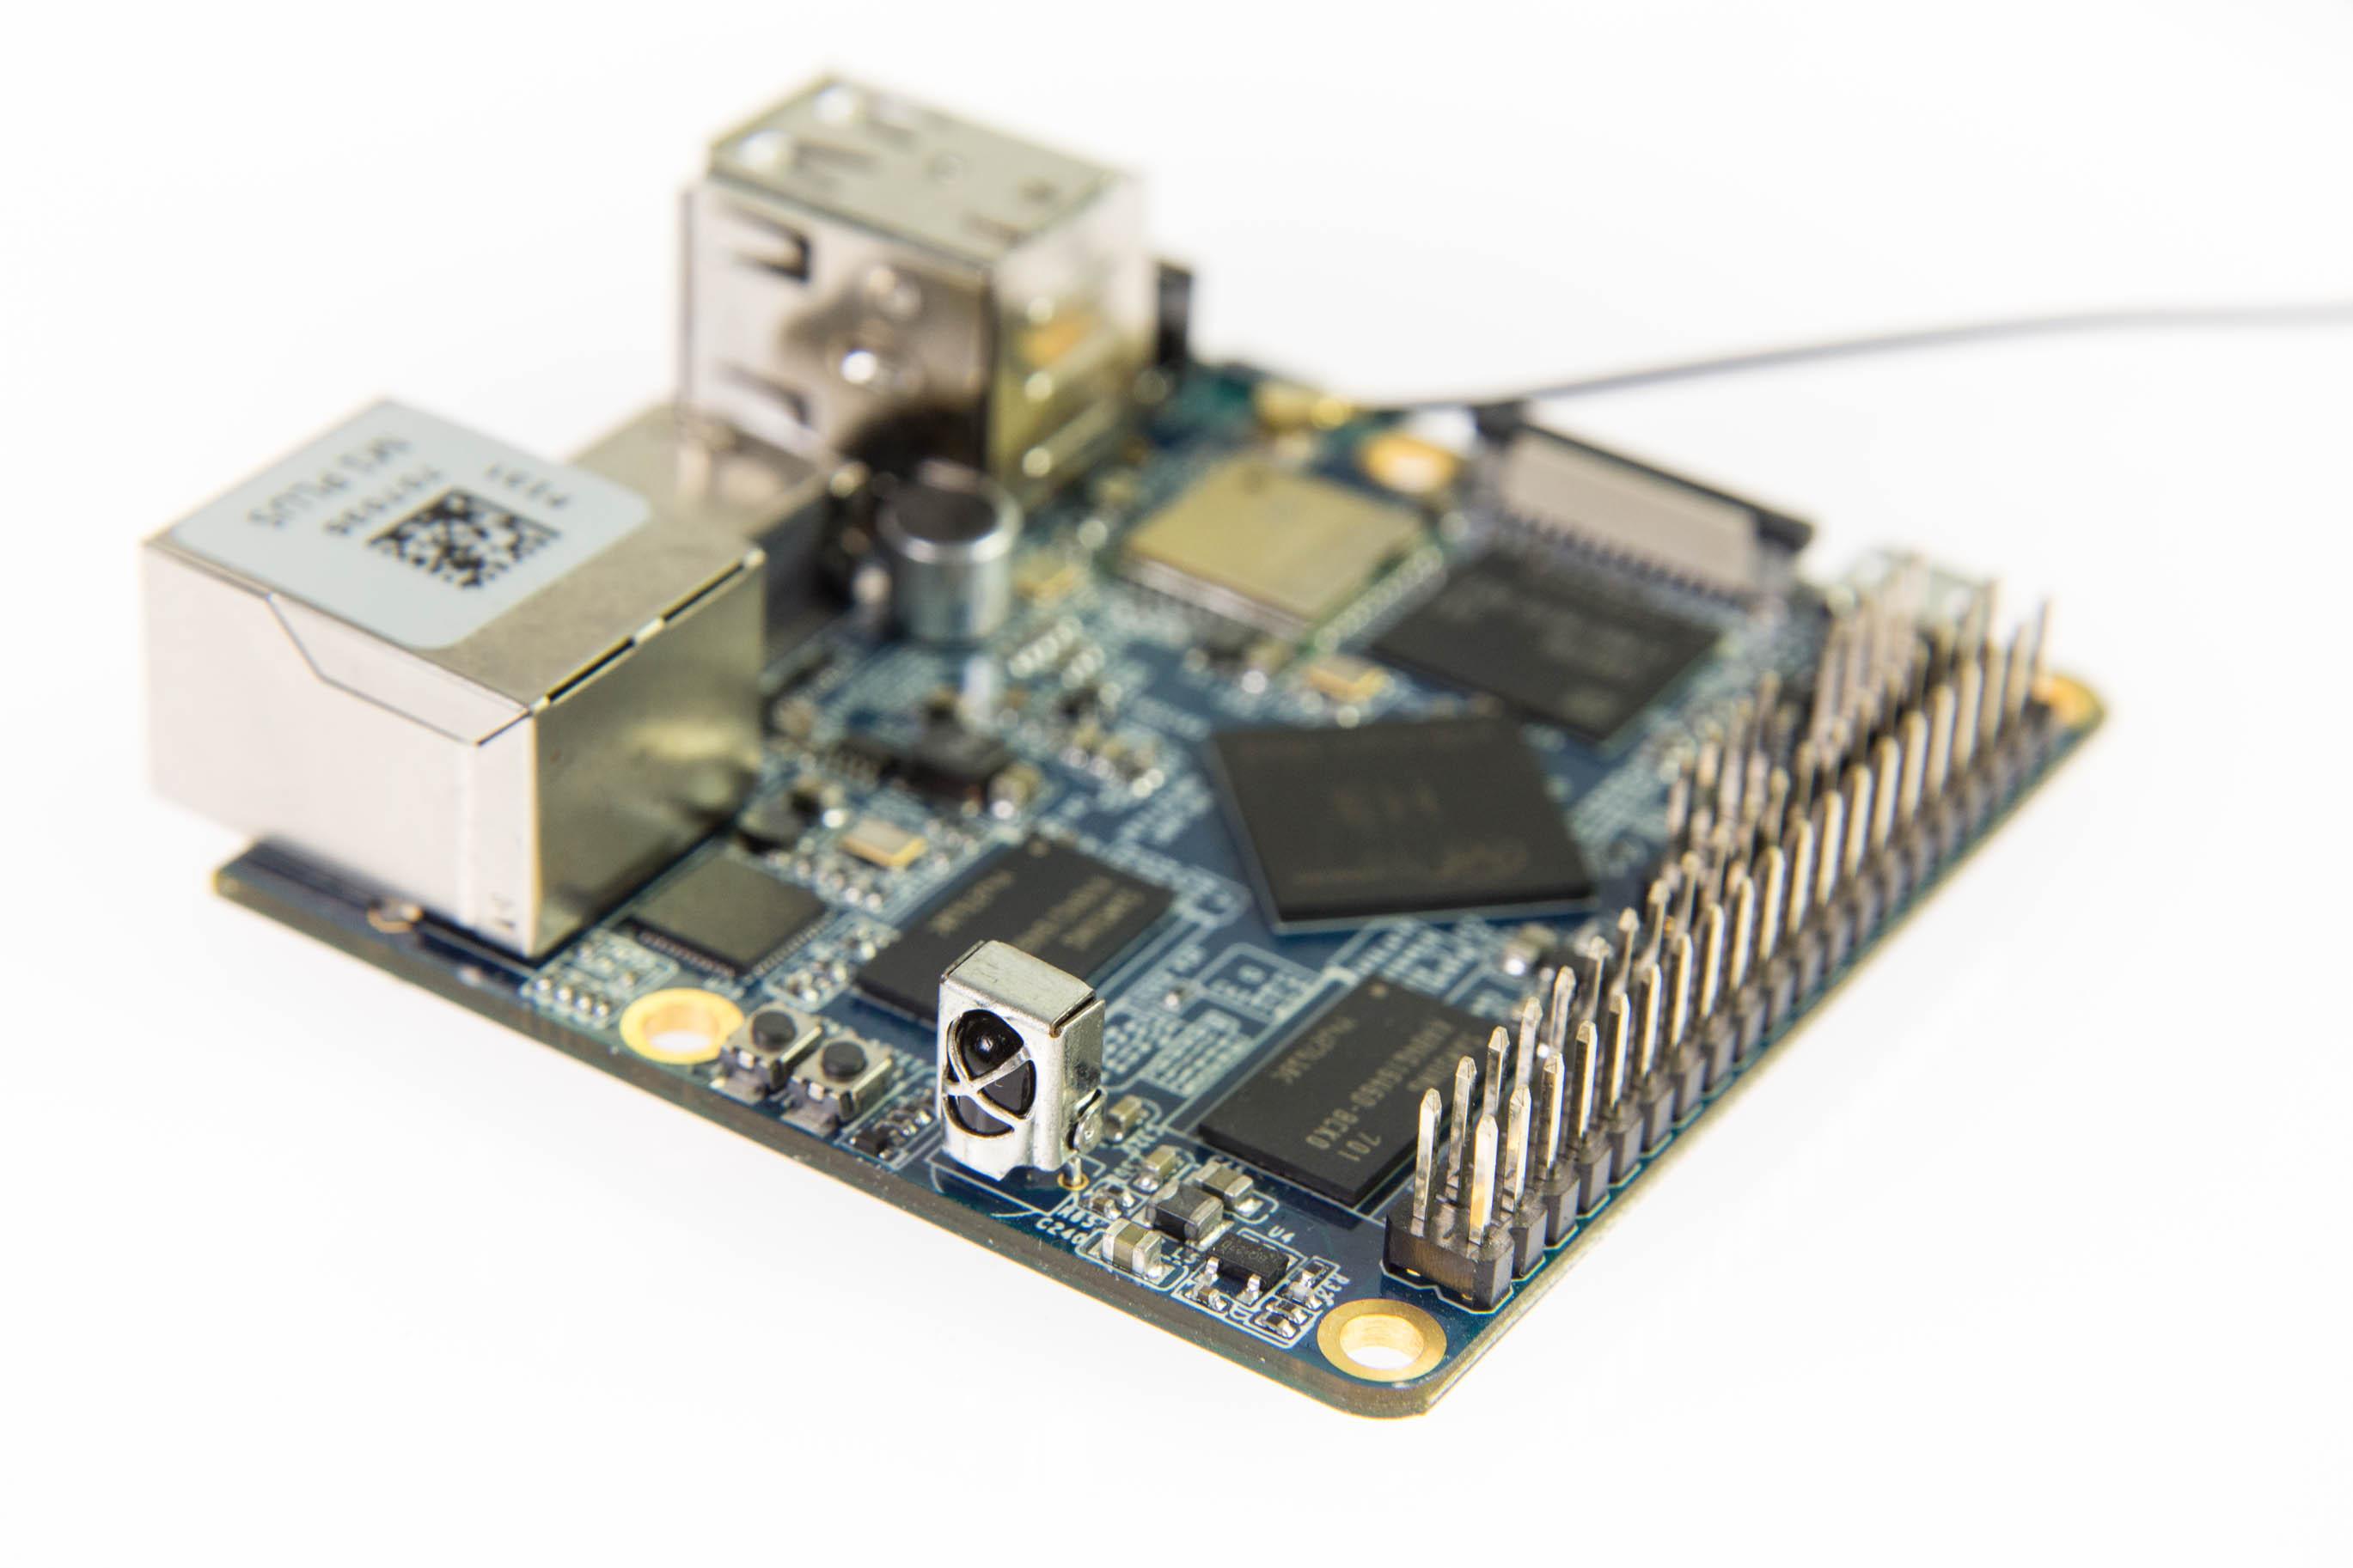 Bastelrechner Nano Pi im Test: Klein, aber nicht unbedingt oho - Nano Pi M1+ (Bild: Martin Wolf/Golem.de)